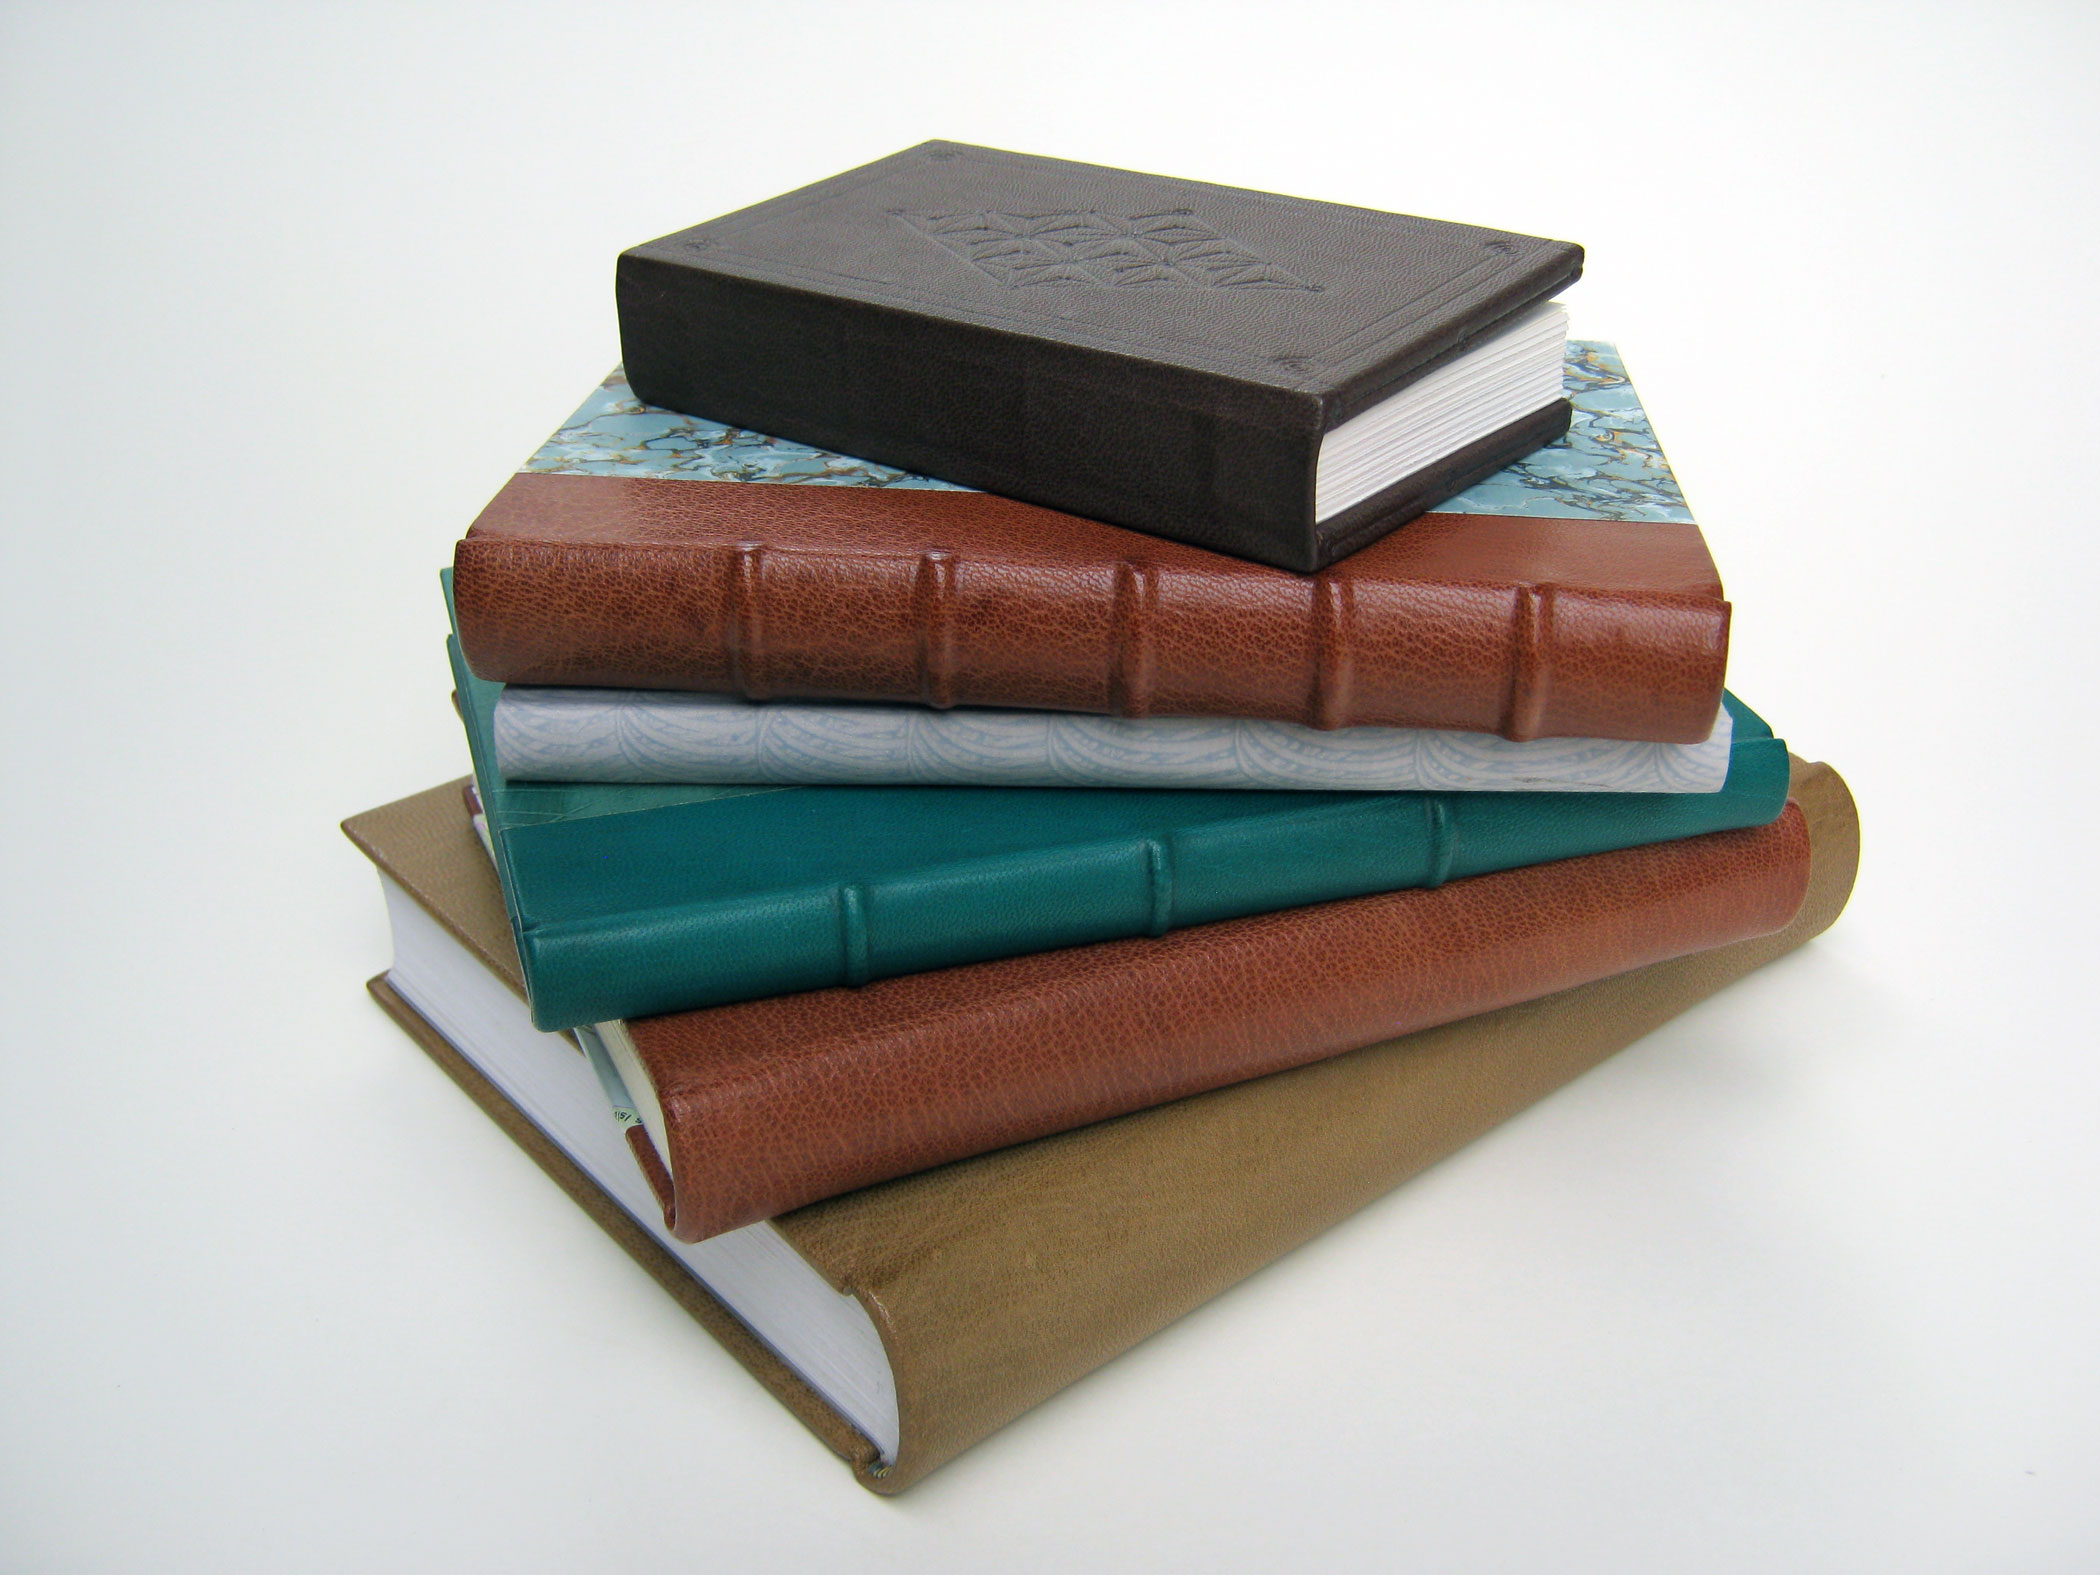 blankbooks-leatherbinding.jpg